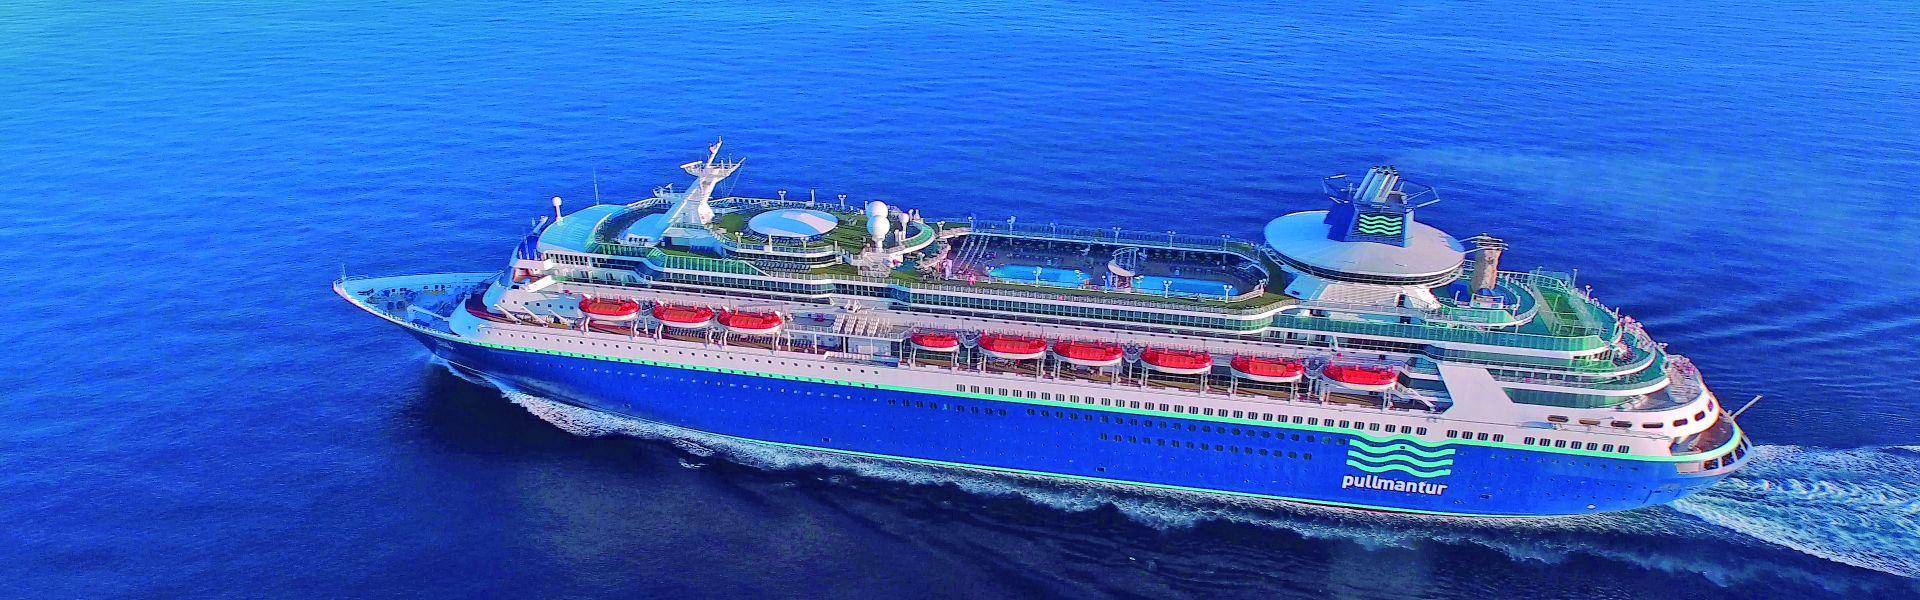 Croaziera 2018 - Mediterana de Vest (Barcelona) - Pullmantur Cruises - Sovereign - 7 nopti